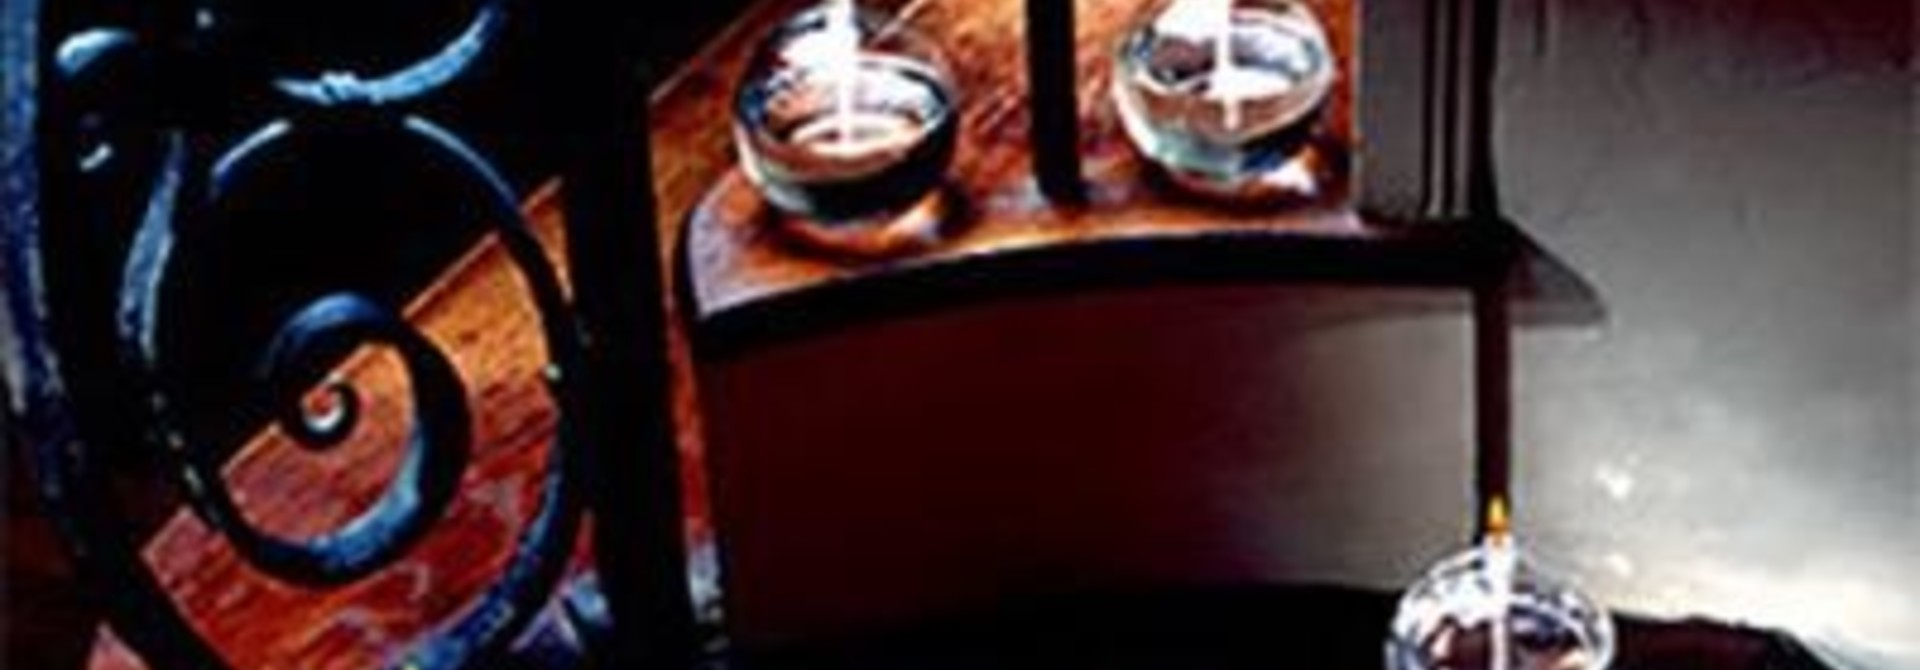 FIRELIGHT - Lamp Sonata  6,5cm